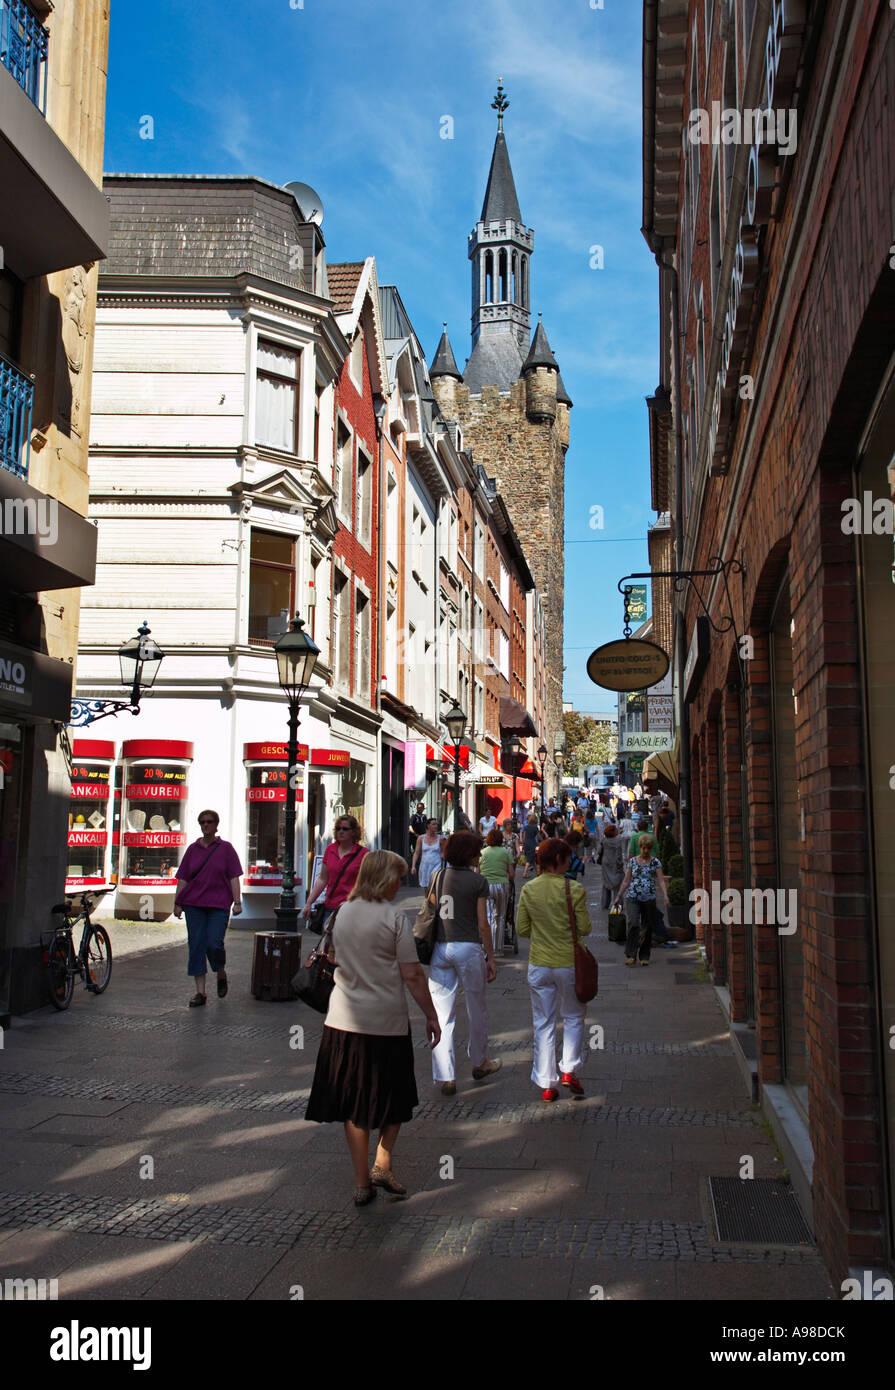 Shopping in Krämerstrasse, Aachen, Germany - Stock Image